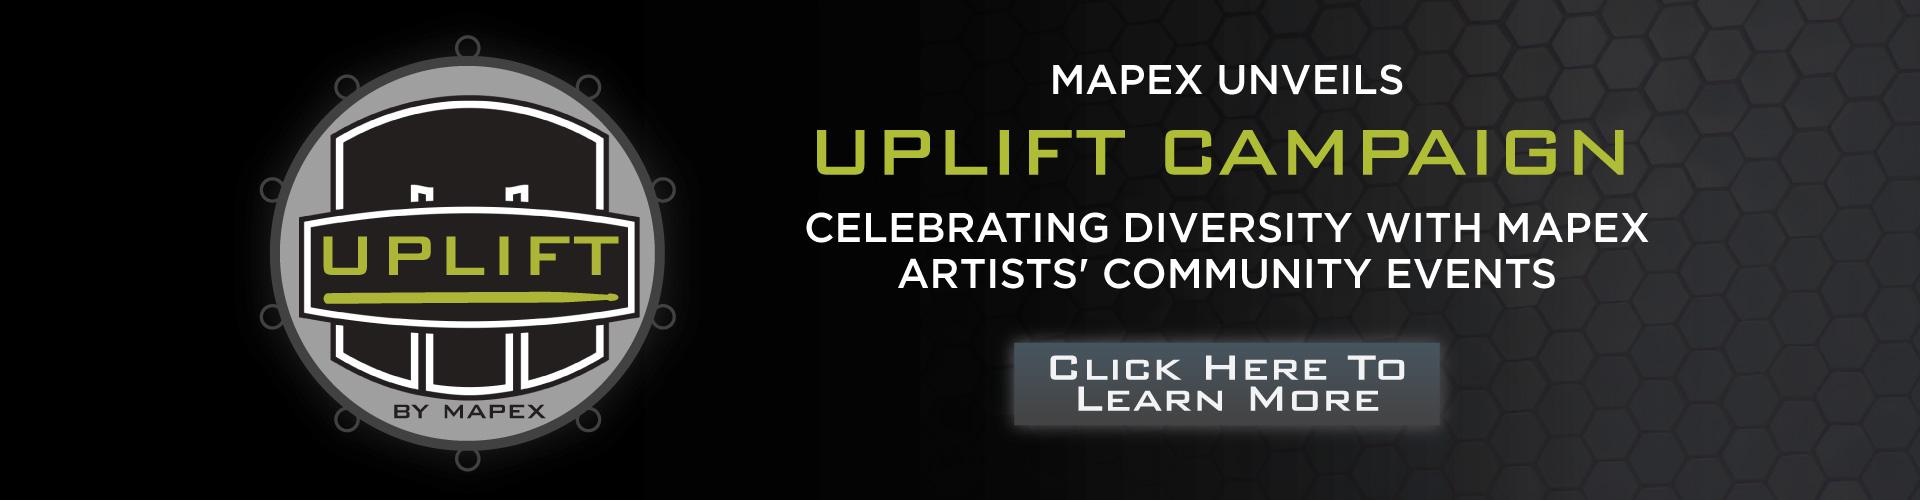 Mapex Uplift